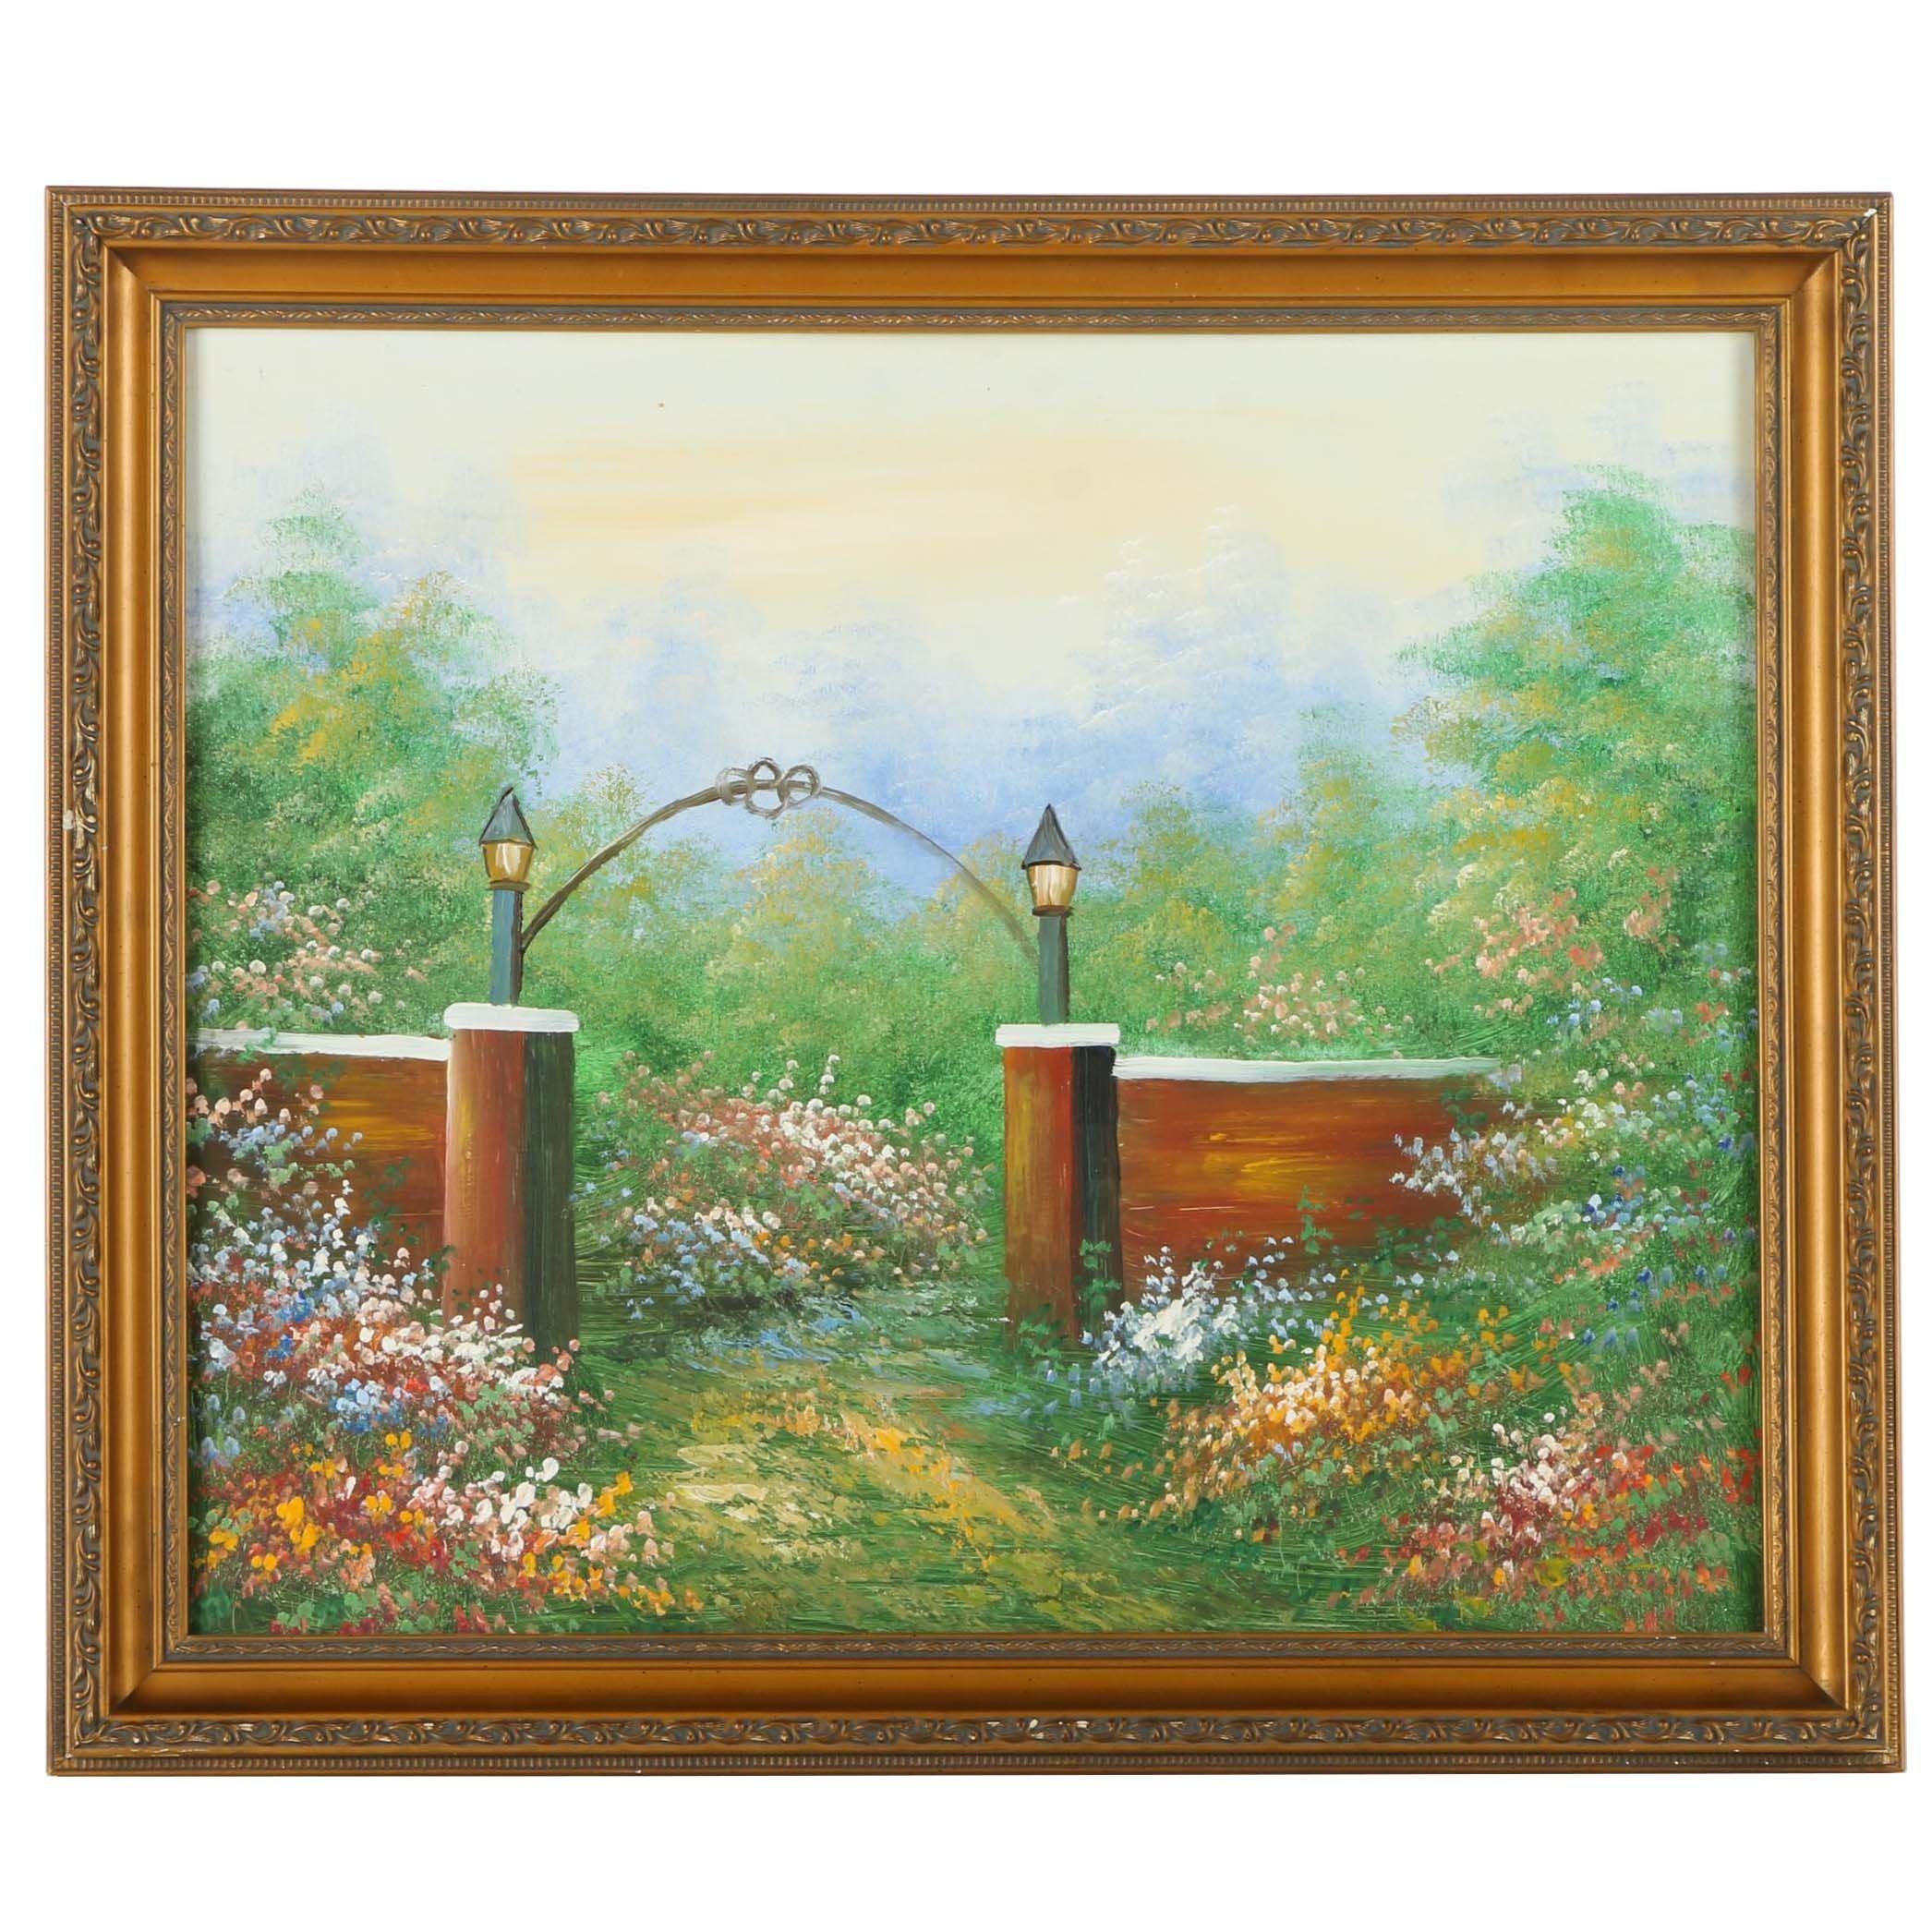 Oil Painting on Board of a Flourishing Garden